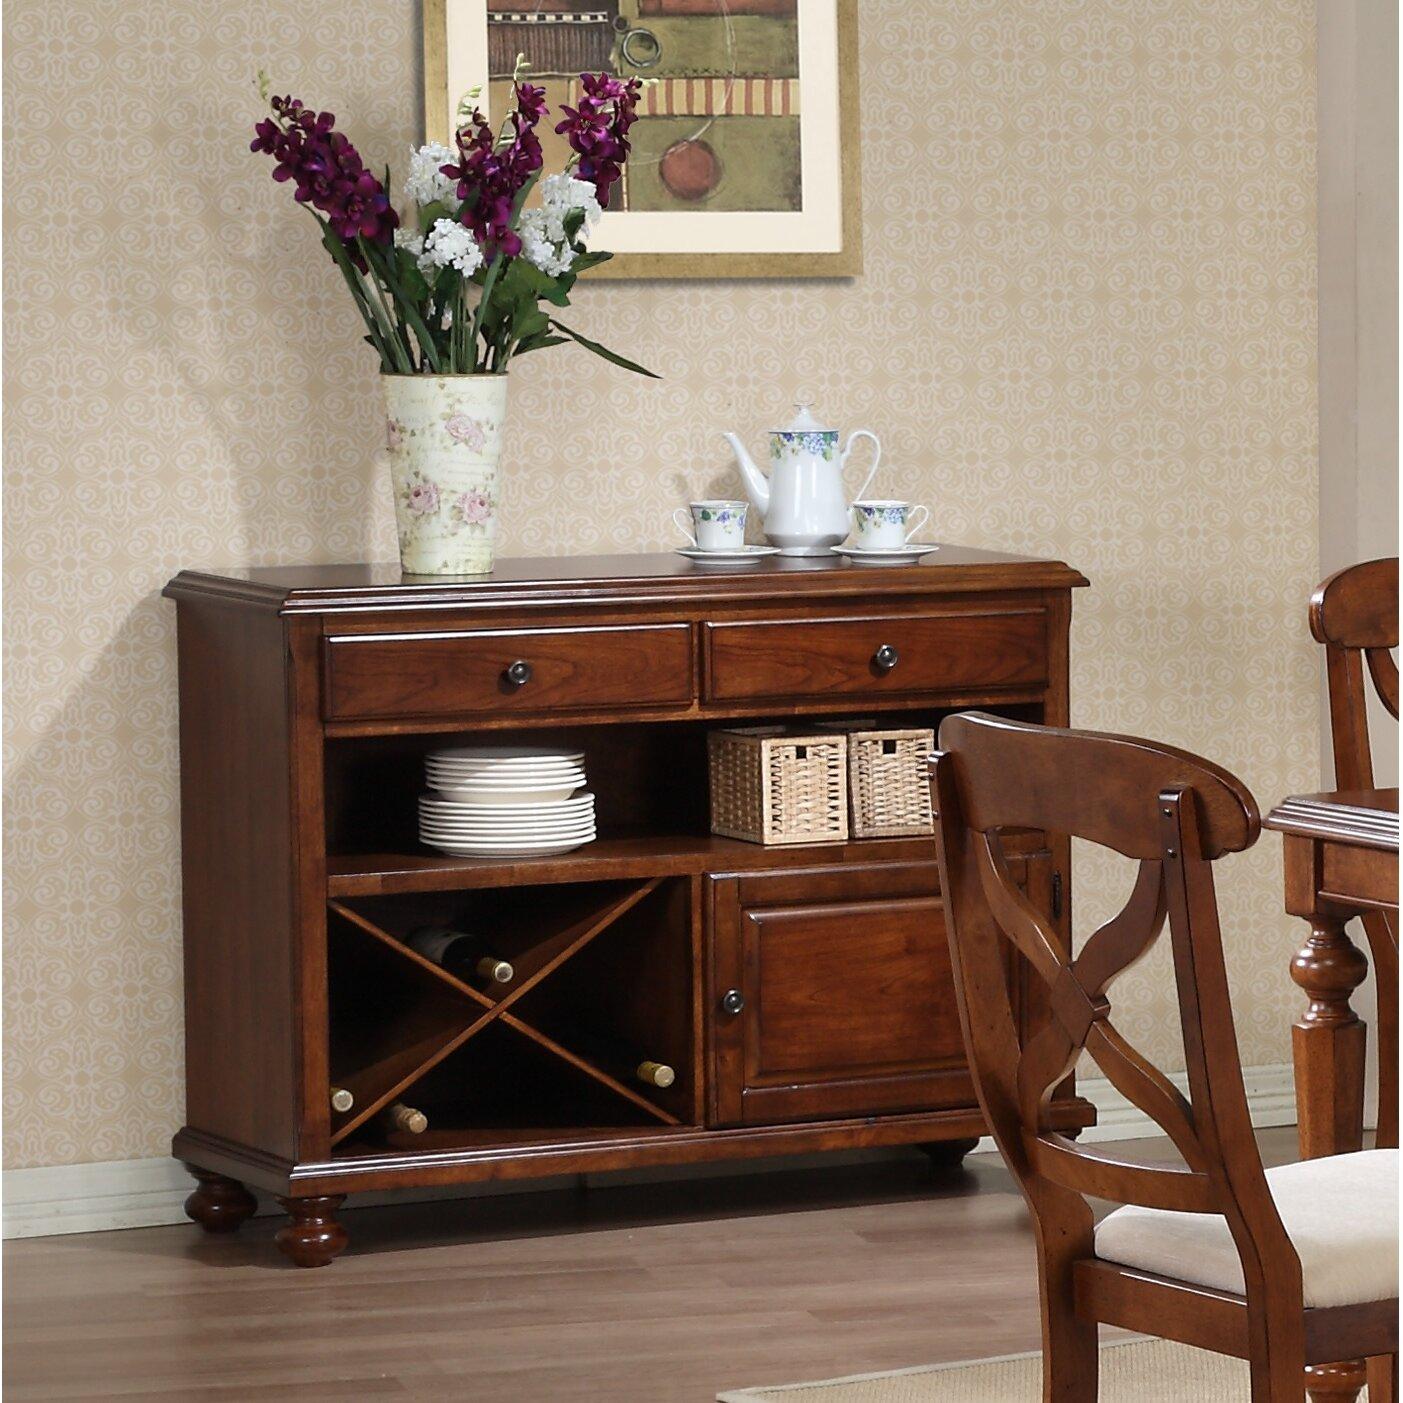 Furniture Kitchen Dining Furniture Wine Bottle Storage Equipped